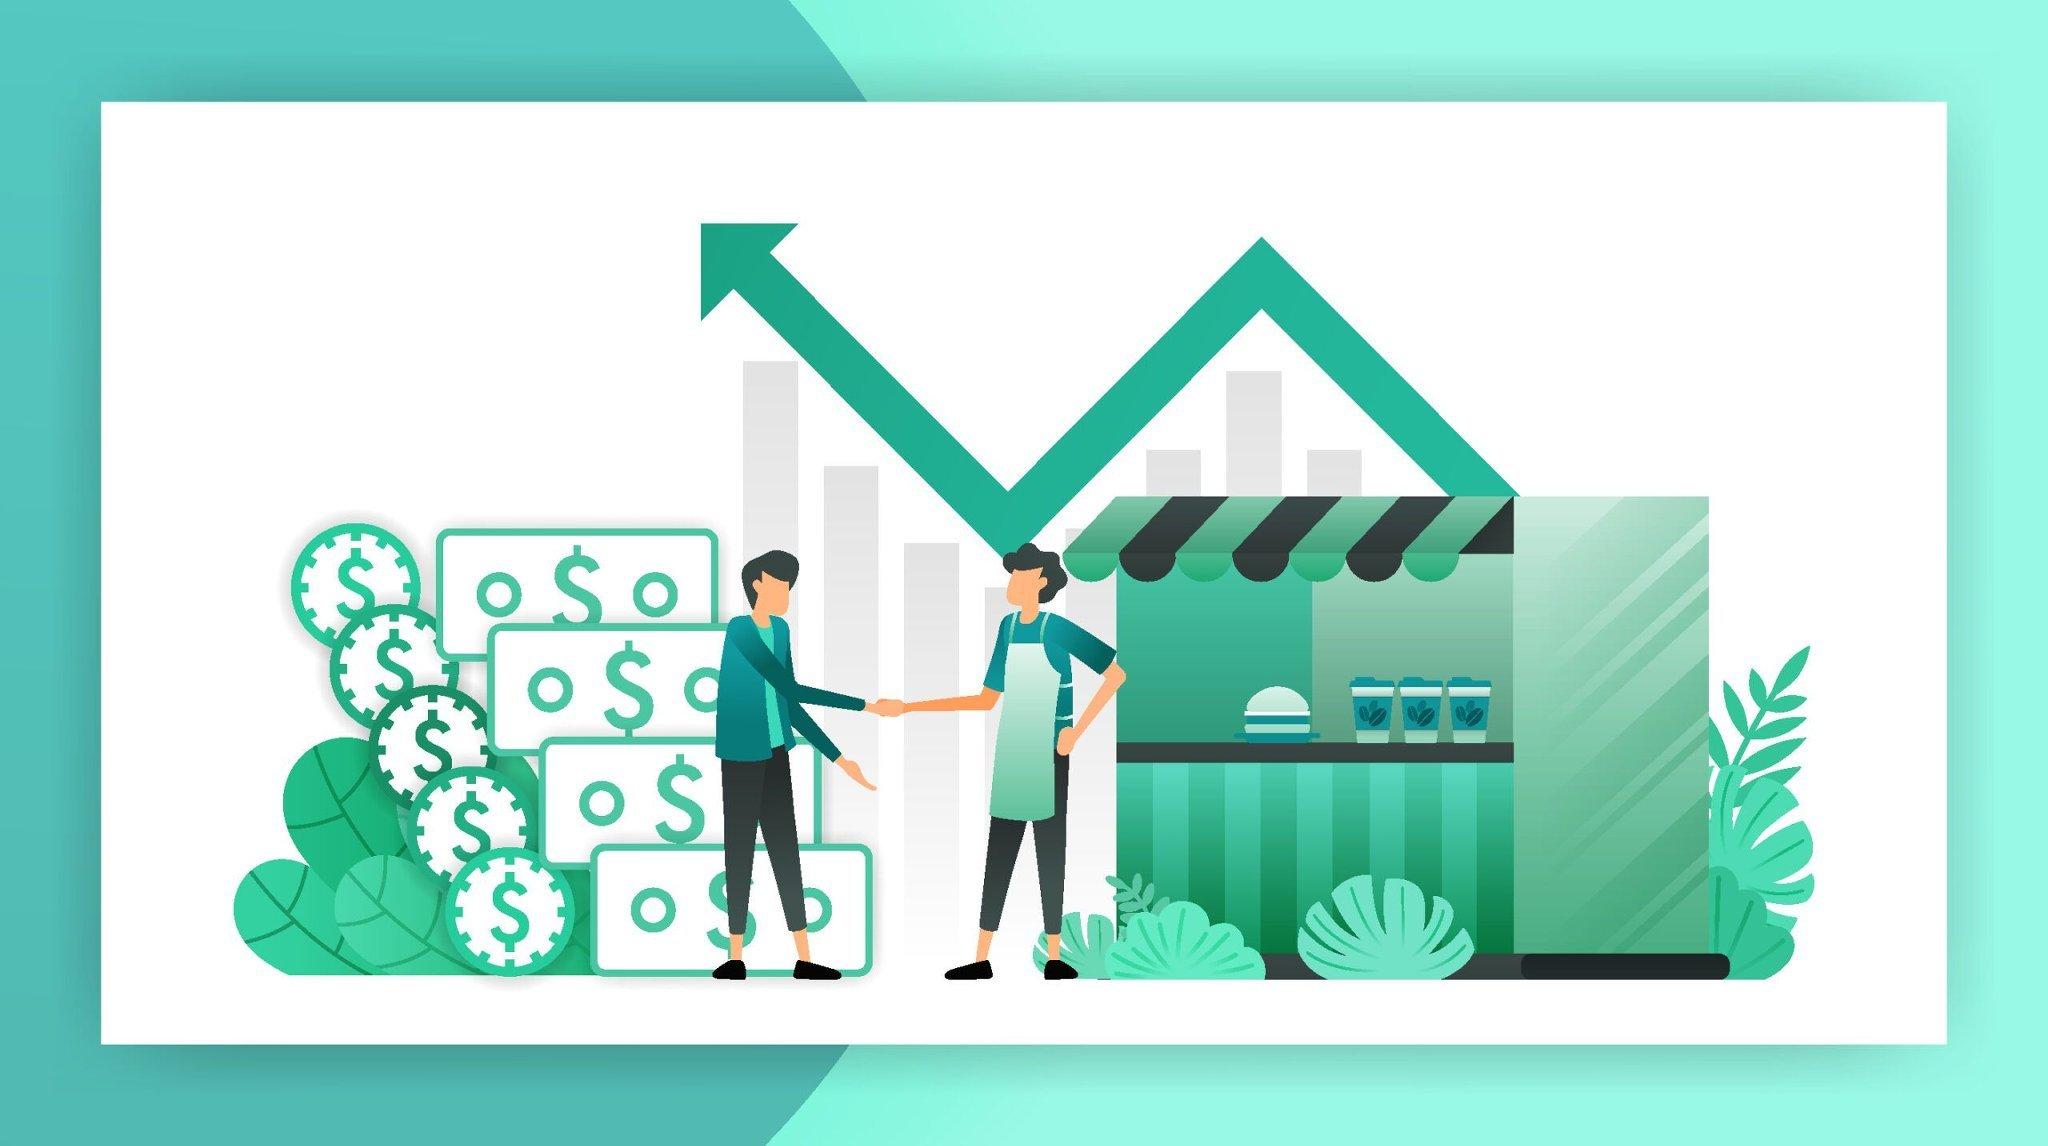 Starting Up: Ways to Save Money as an Entrepreneur